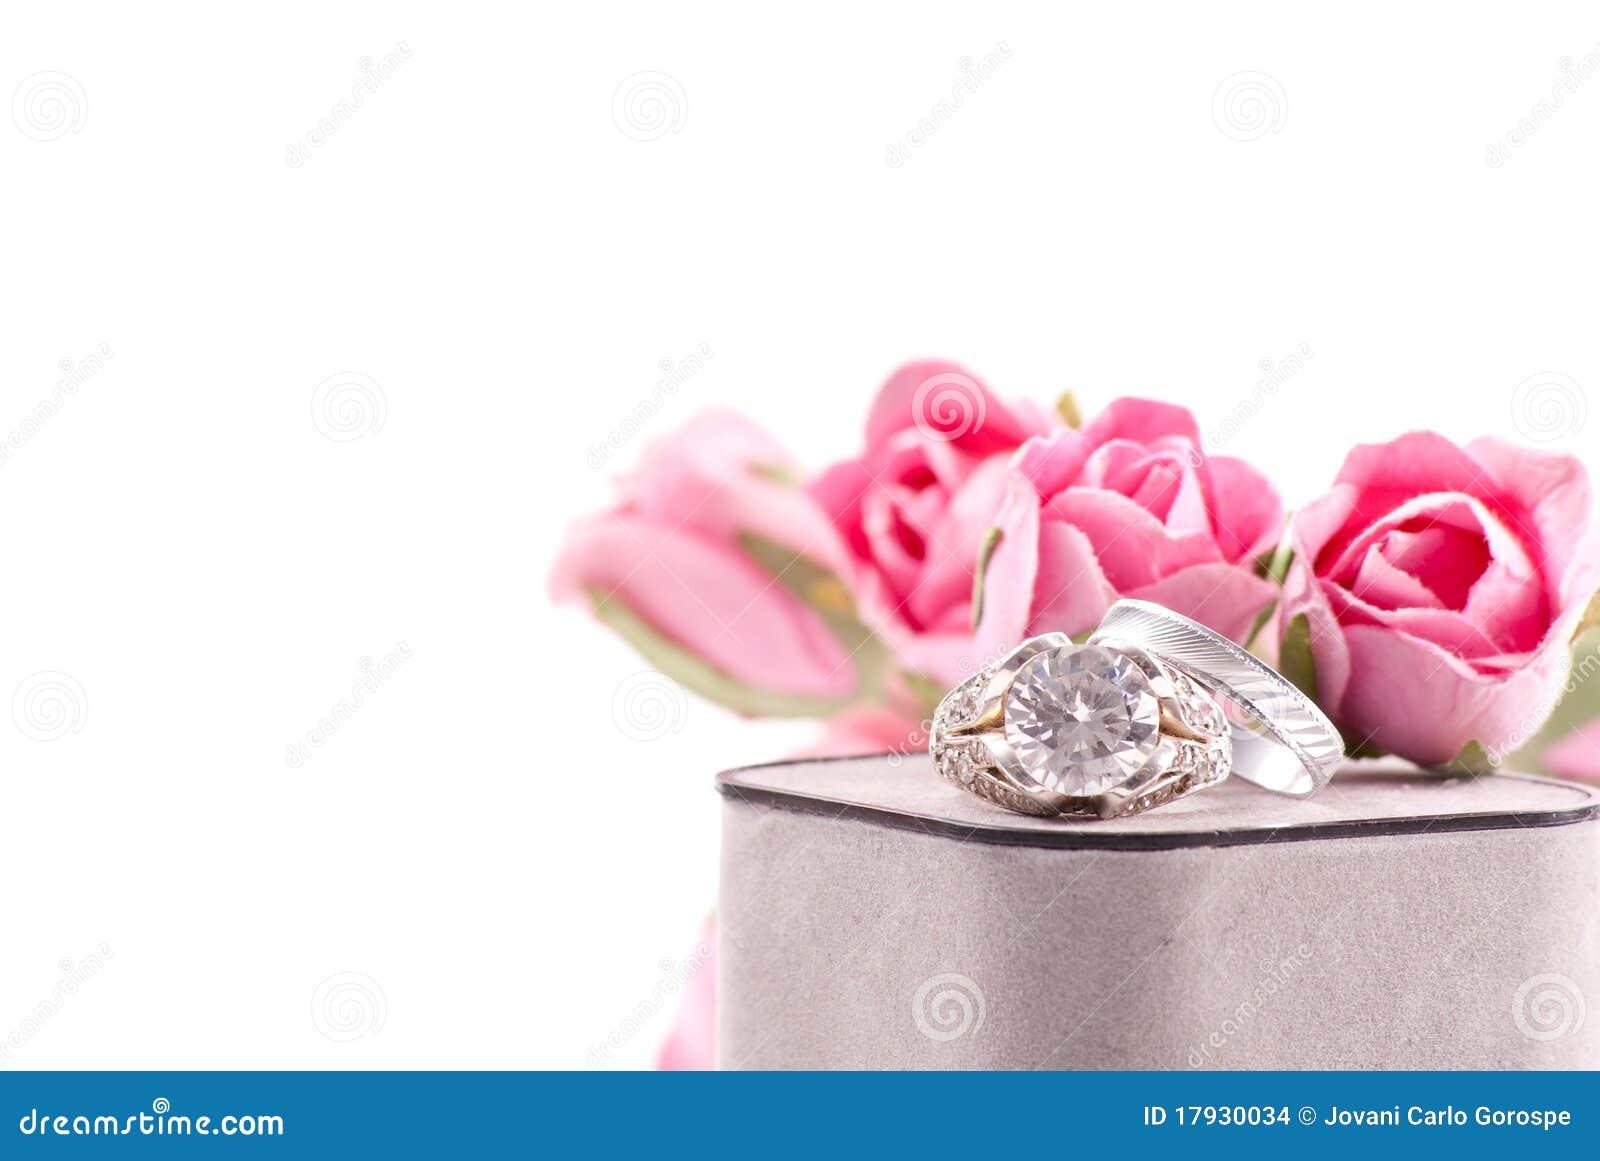 Wedding Ring And Band